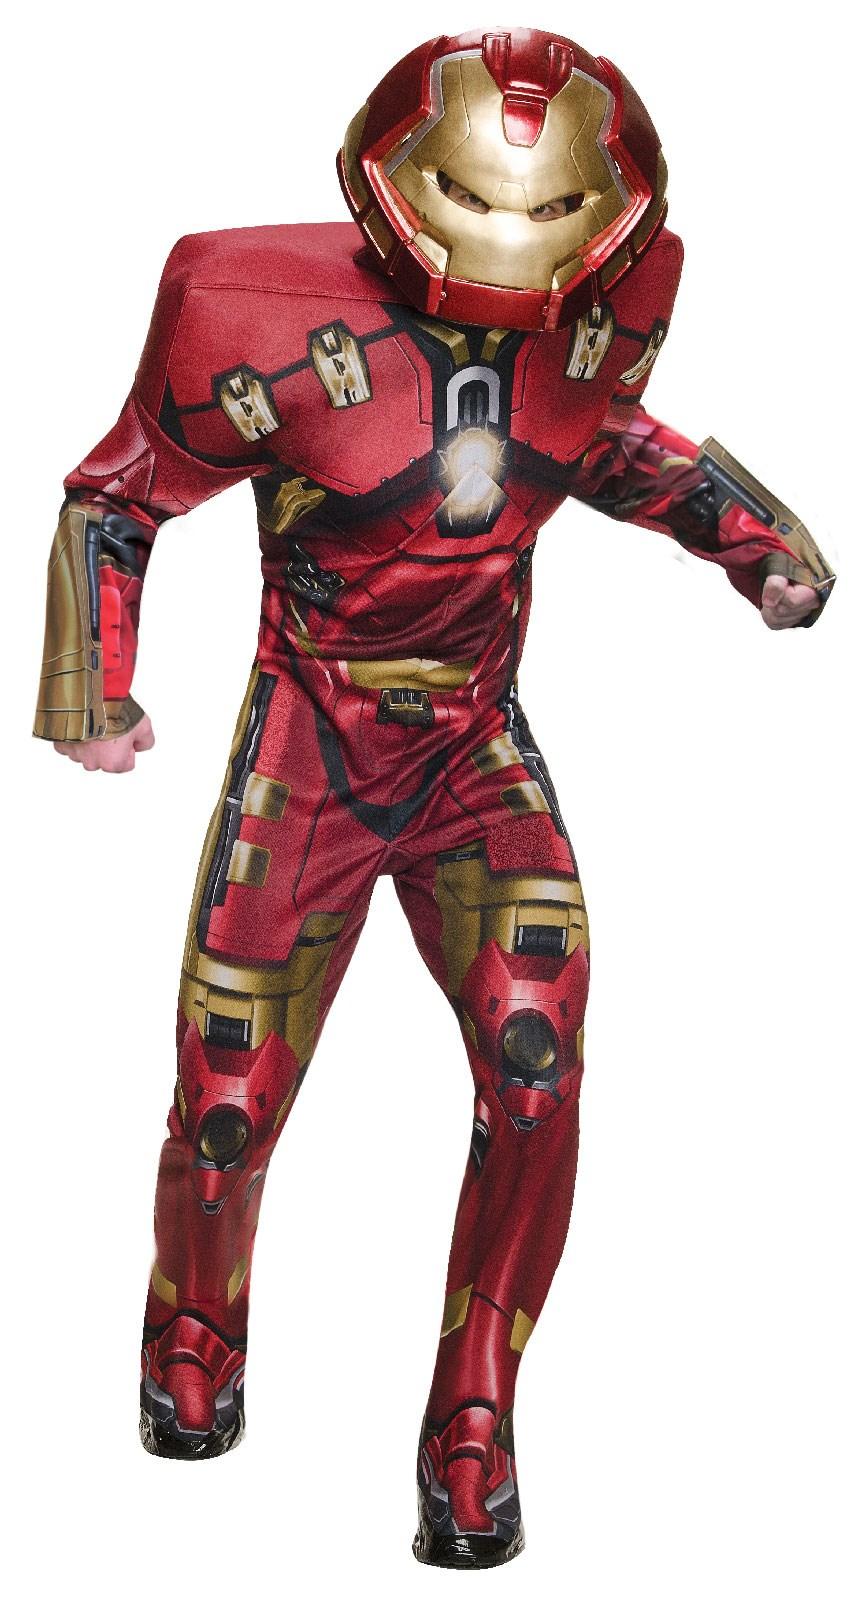 Avengers 2 - Age of Ultron: Deluxe Hulk Buster Costume For Men